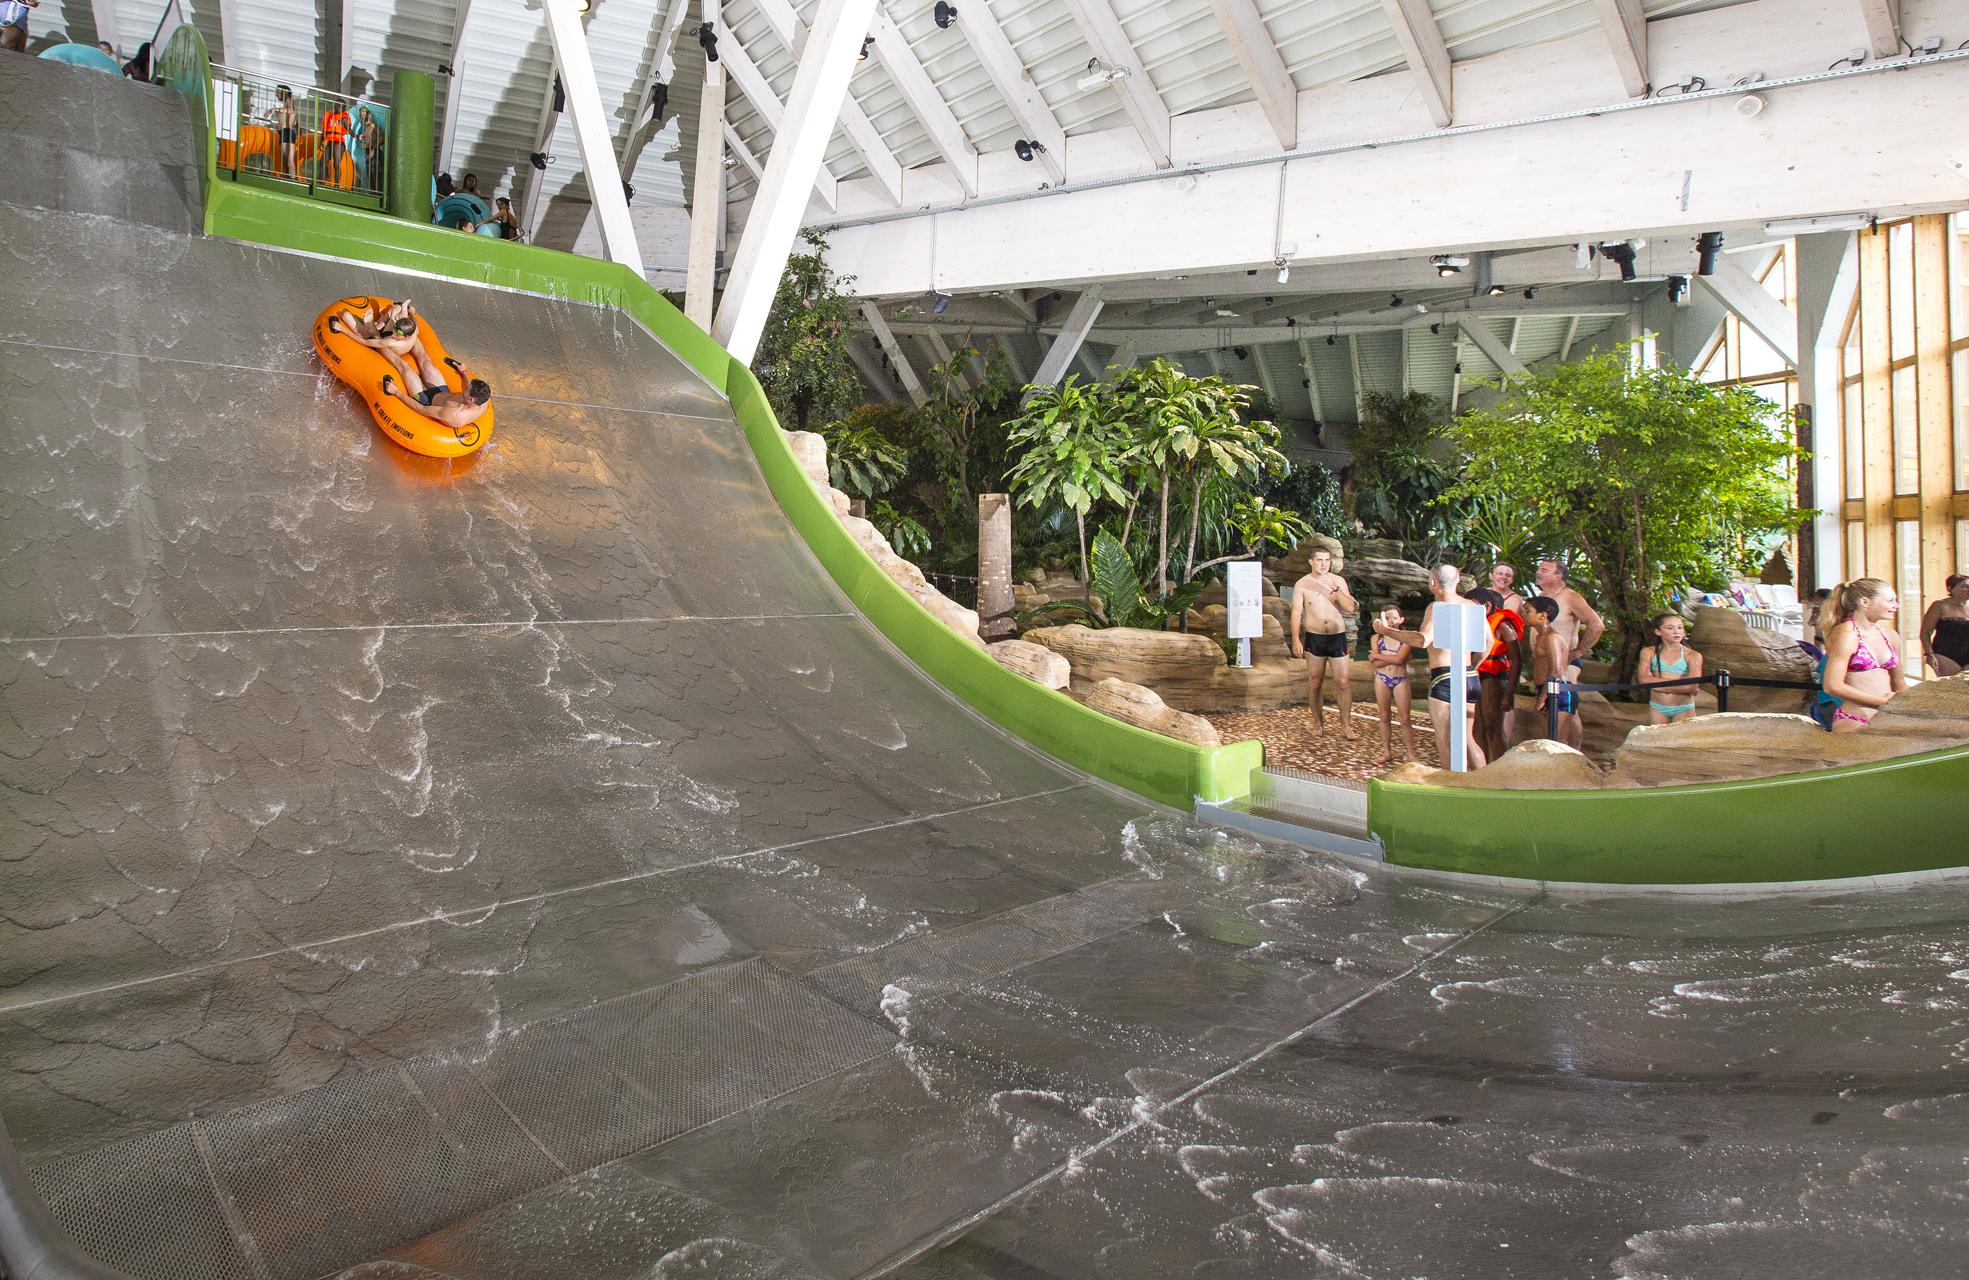 Aquariaz : Parc Aquatique Portes Du Soleil, Station De Ski ... avec Avoriaz Piscine